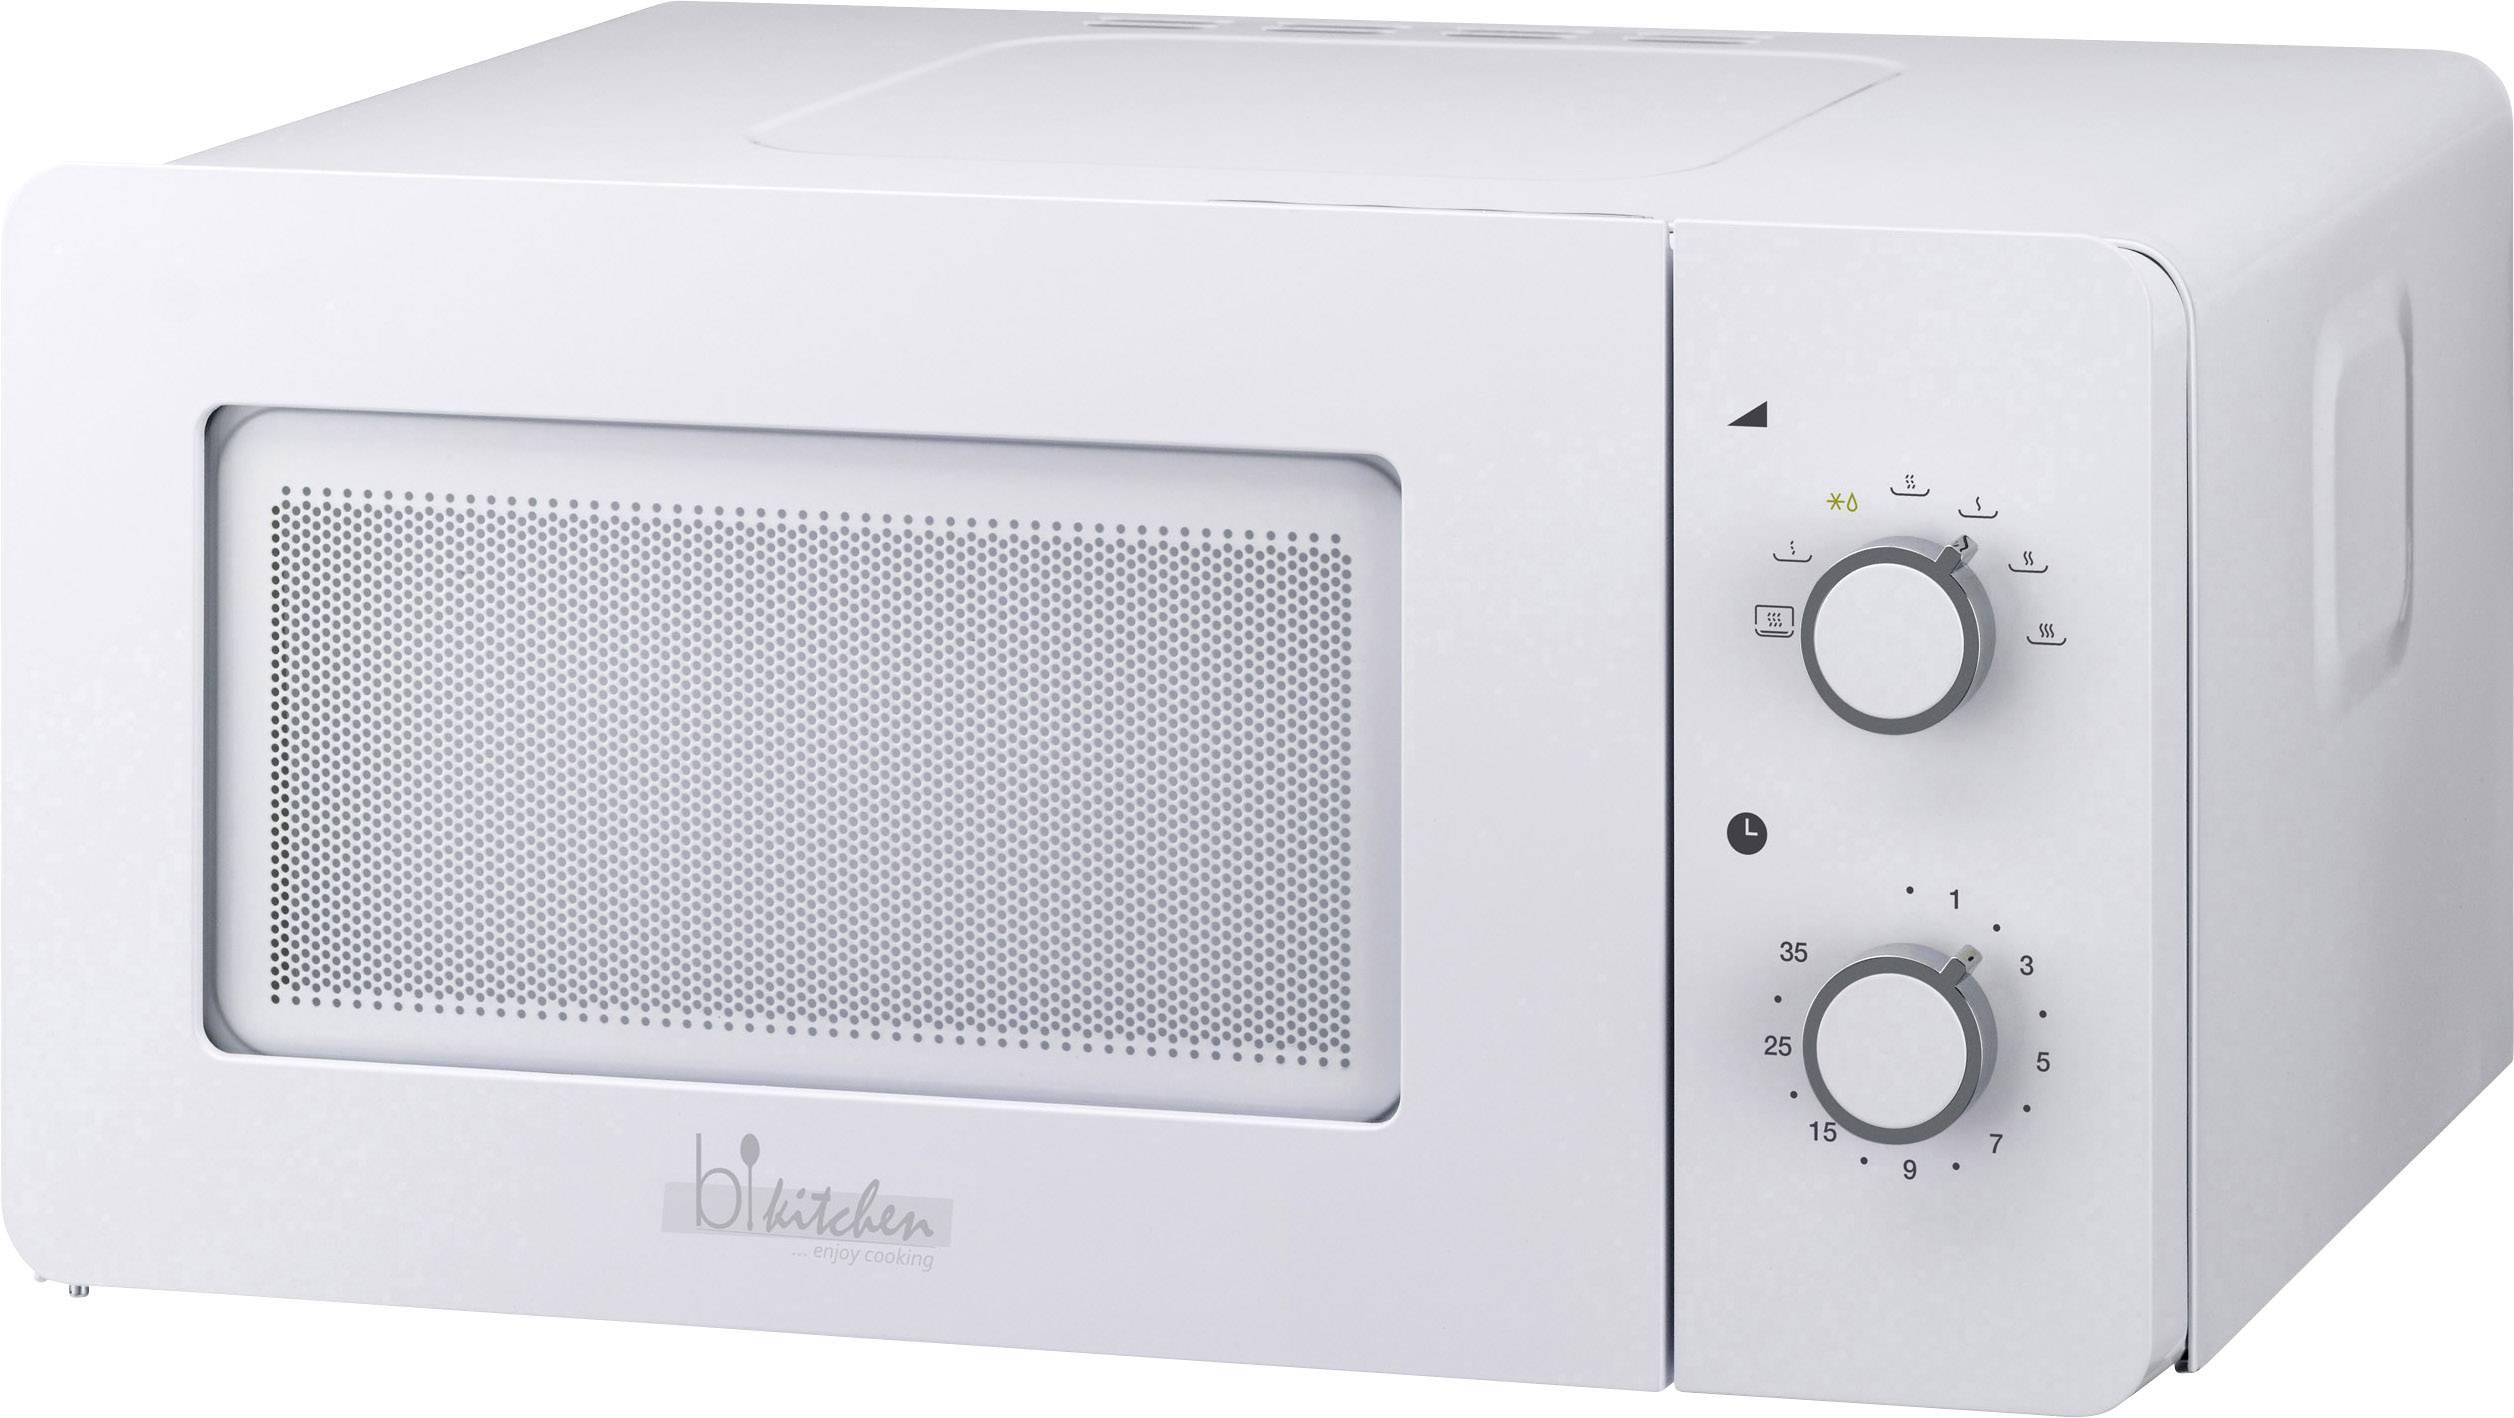 Clatronic MWG 792 Mikrowelle Weiß 700 W Grillfunktion kaufen